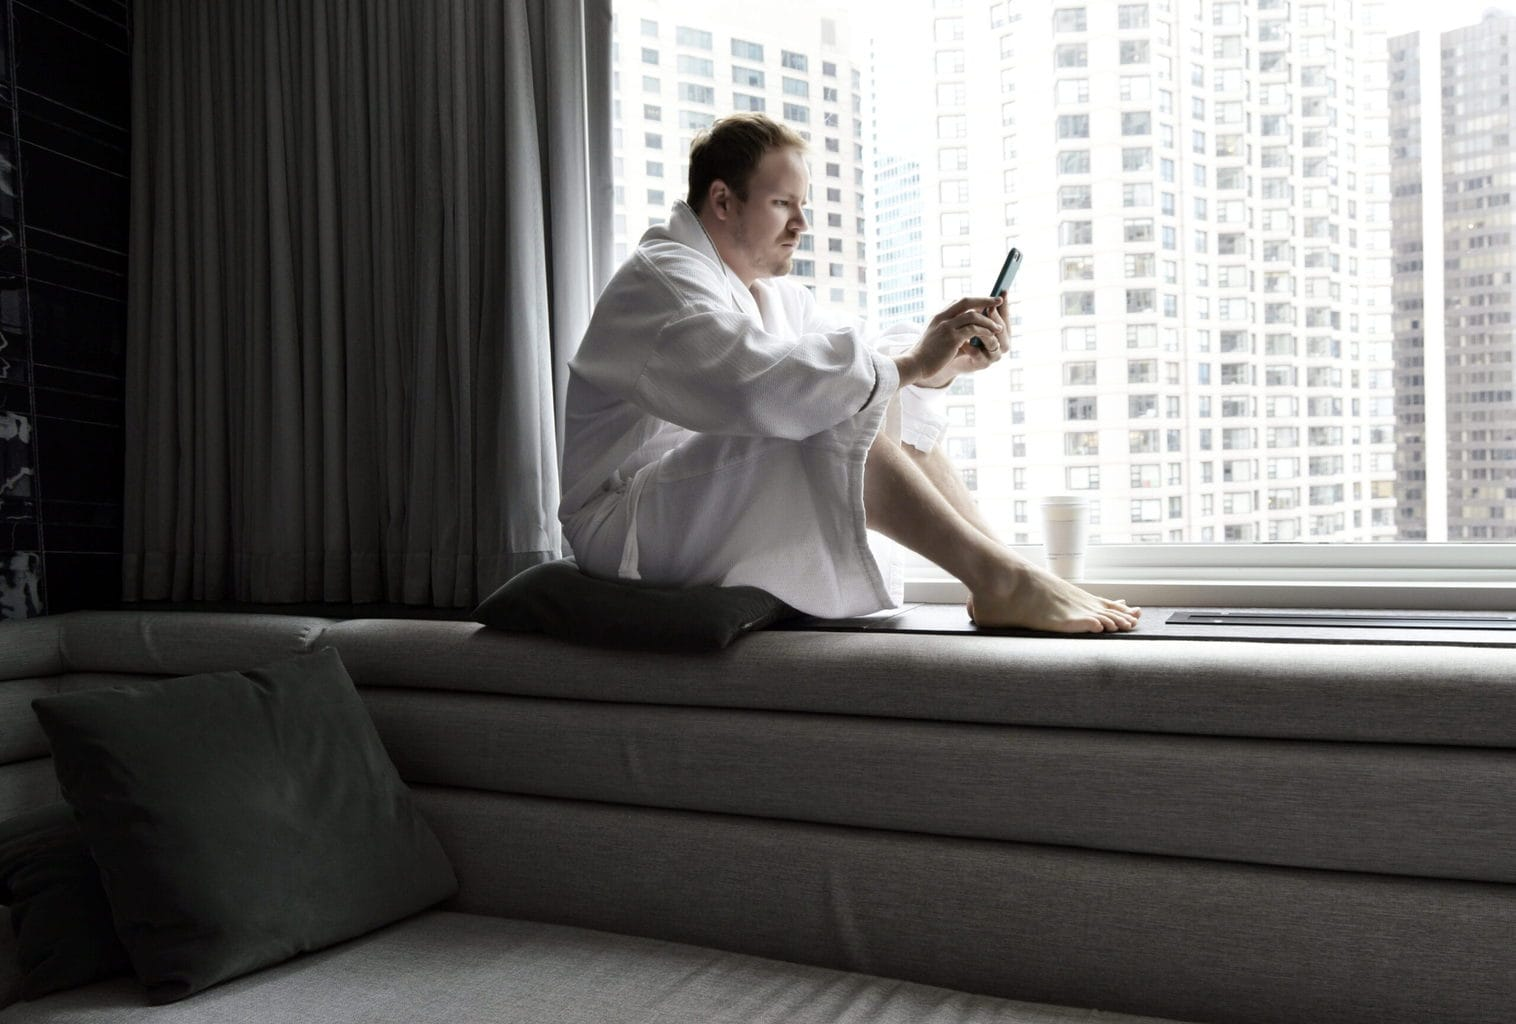 Experience a digital concierge service